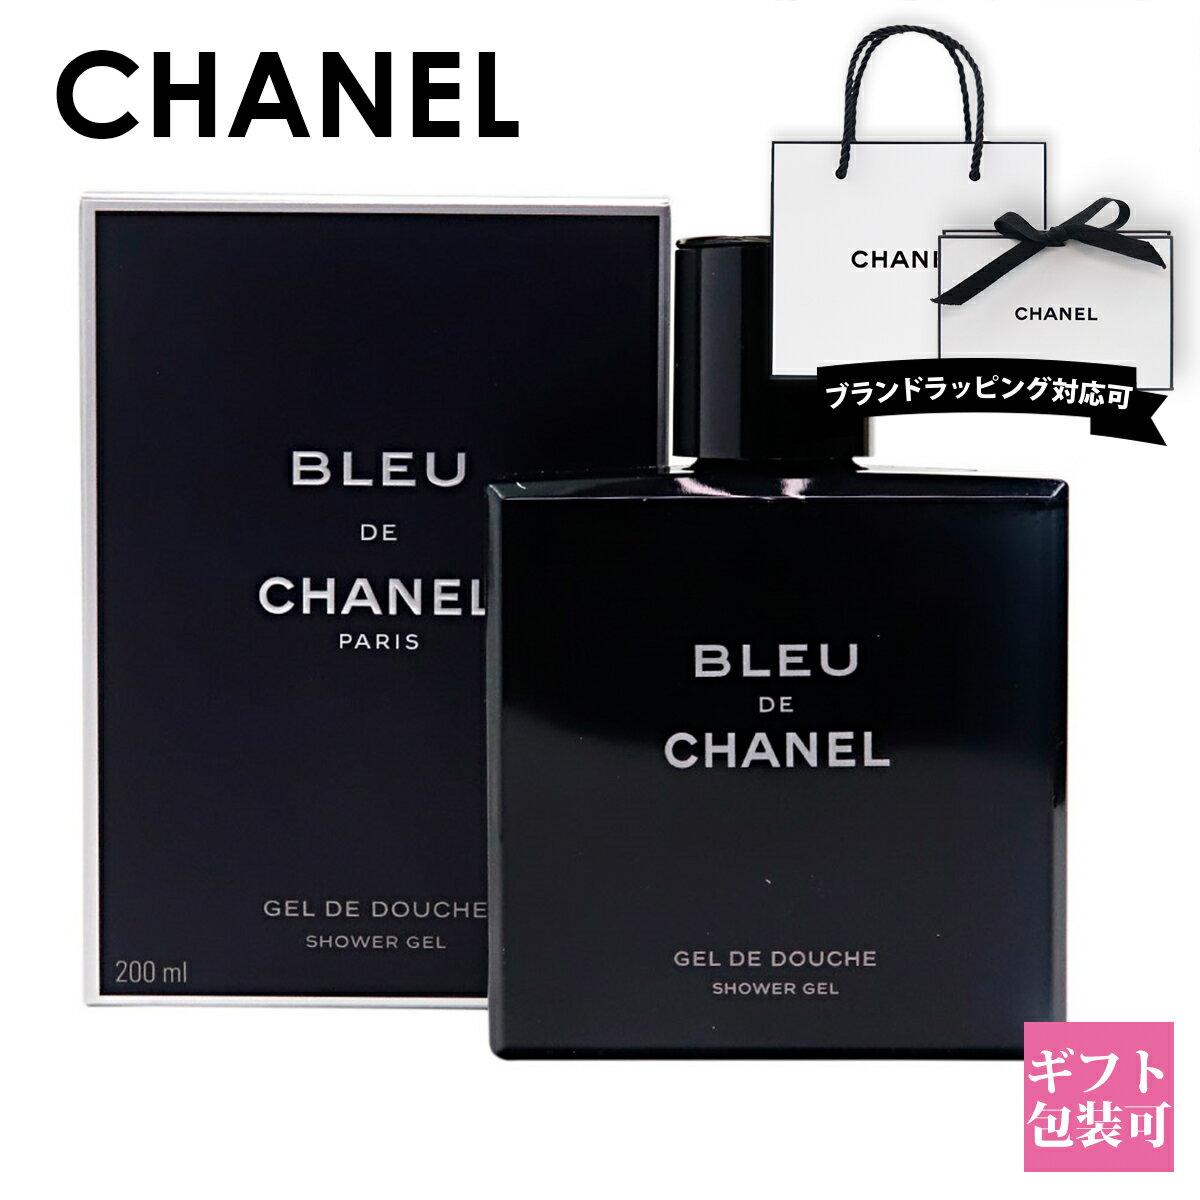 bd9b9d0fdb46 200ml 【 CHANEL ボディ ソープ シャワージェル ブルードゥシャネル メンズ 香水 フレグランス .